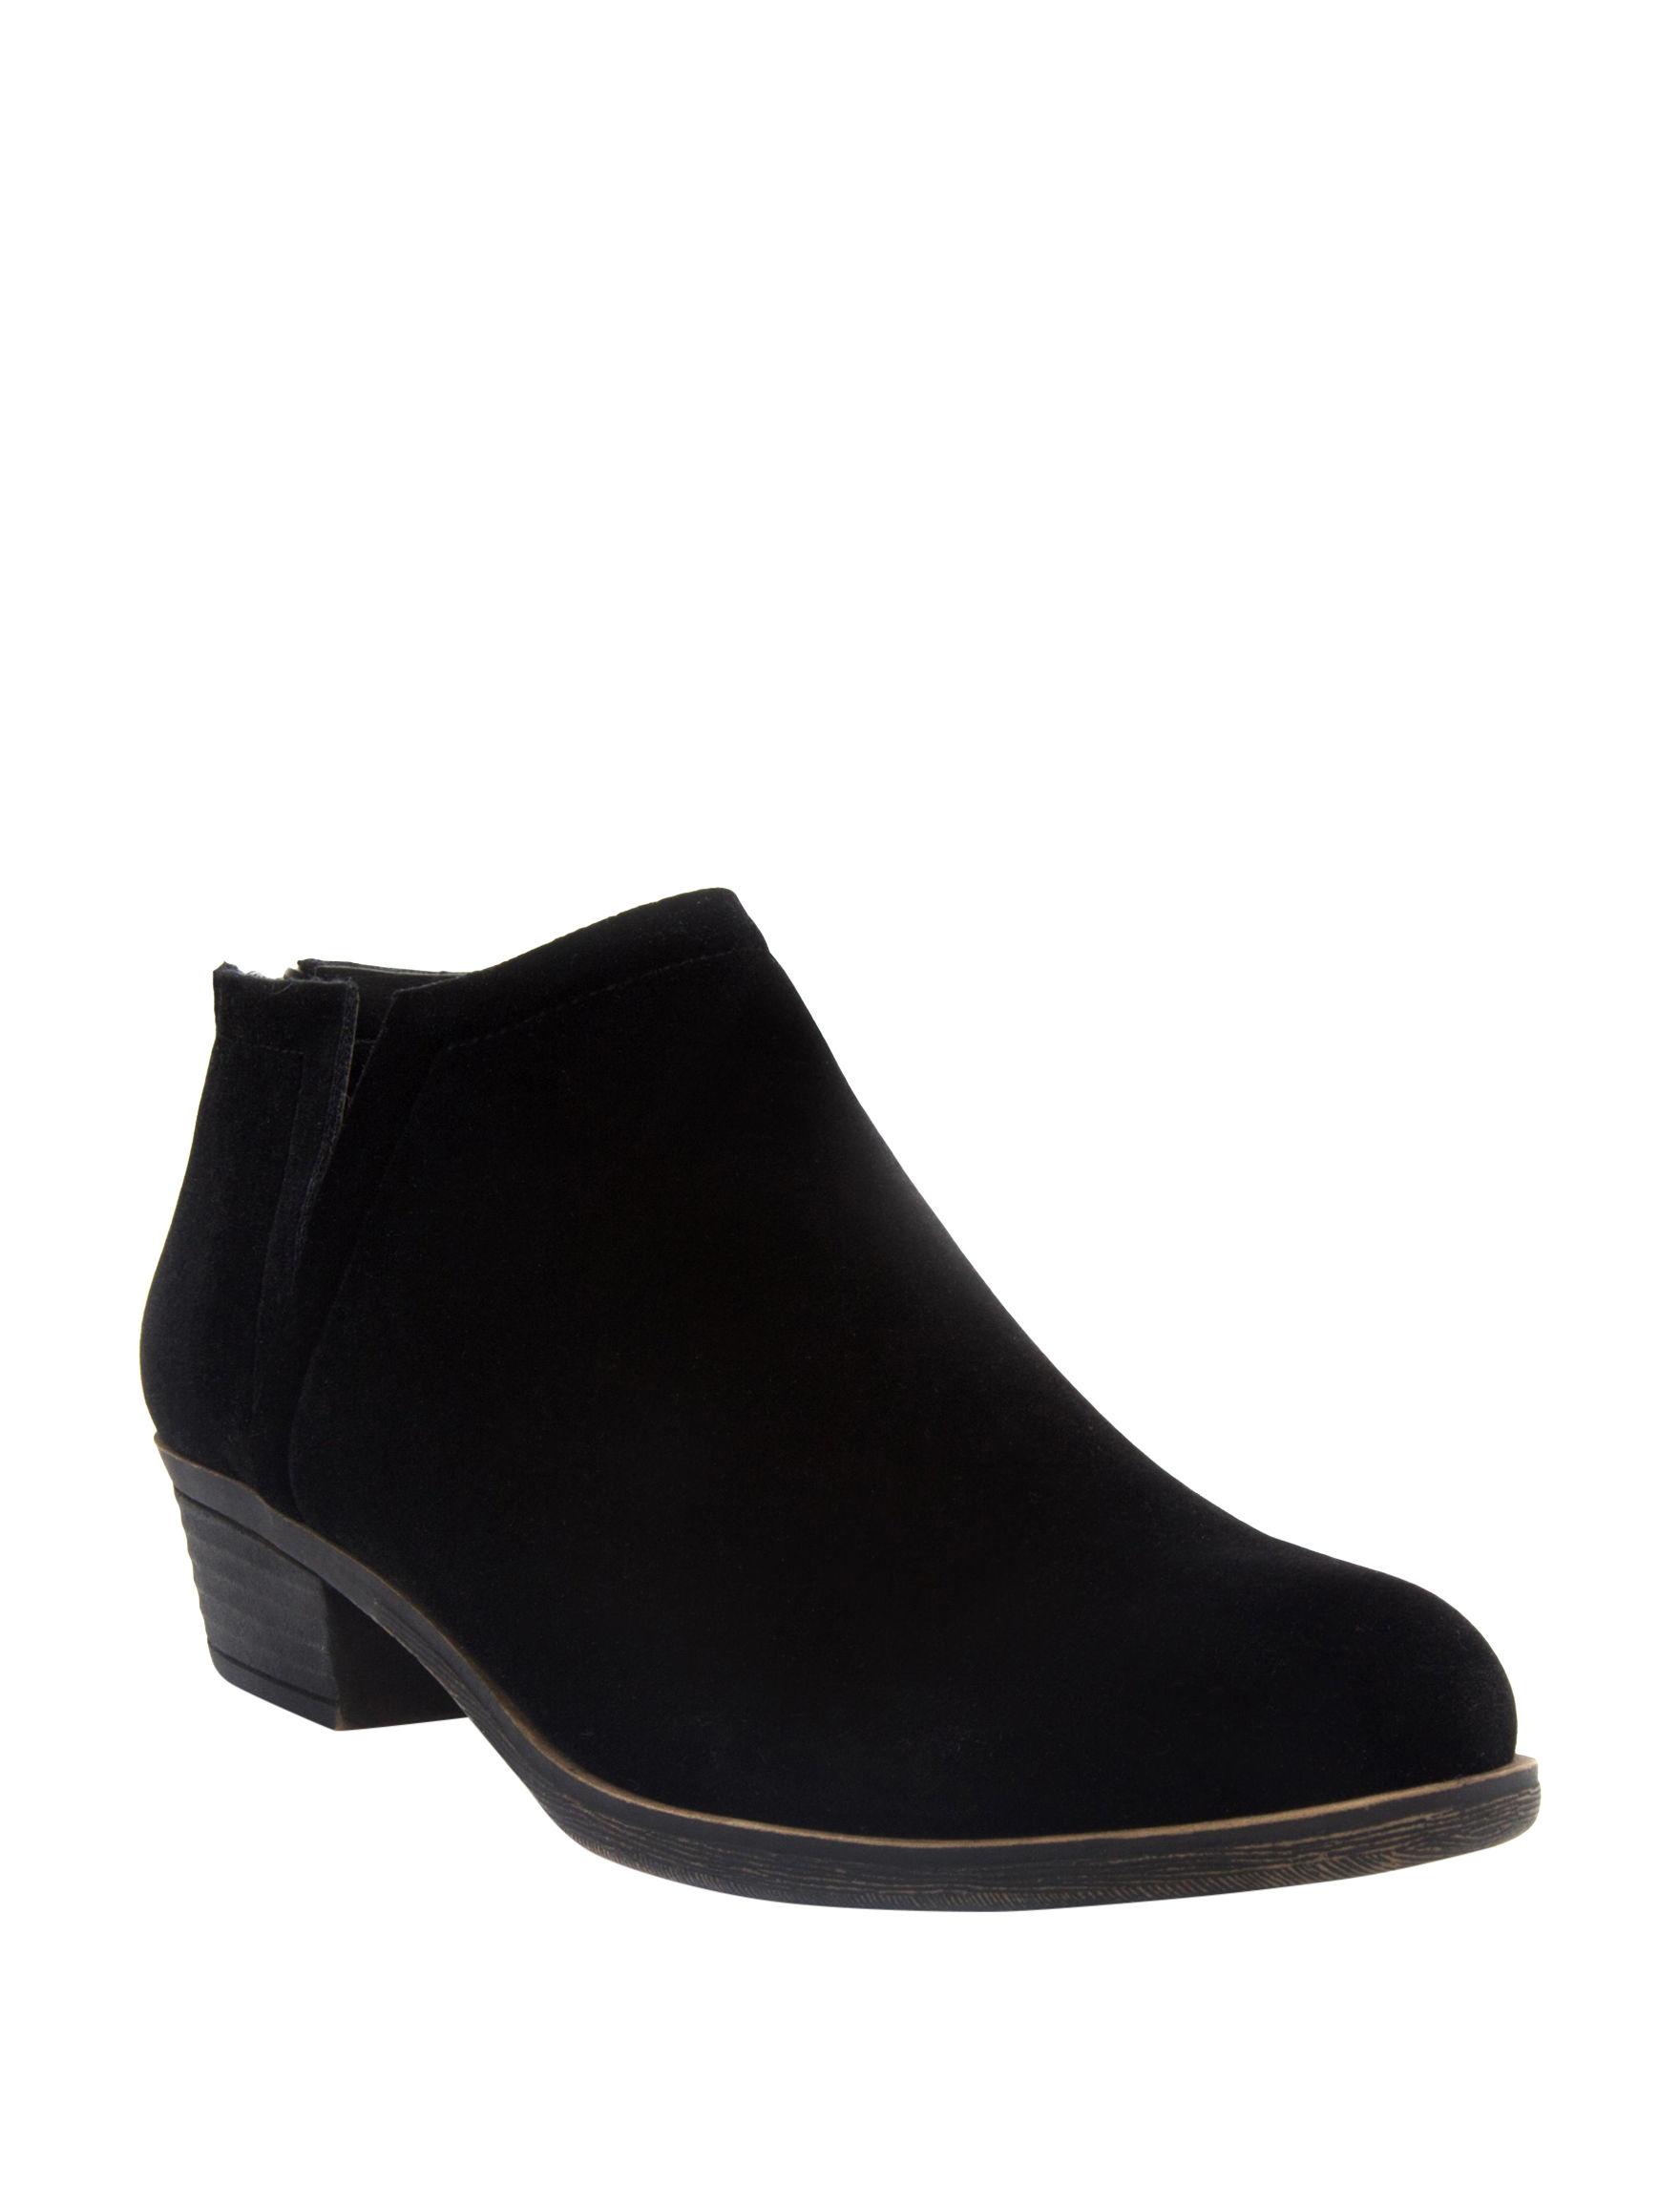 Sugar Black Velvet Ankle Boots & Booties